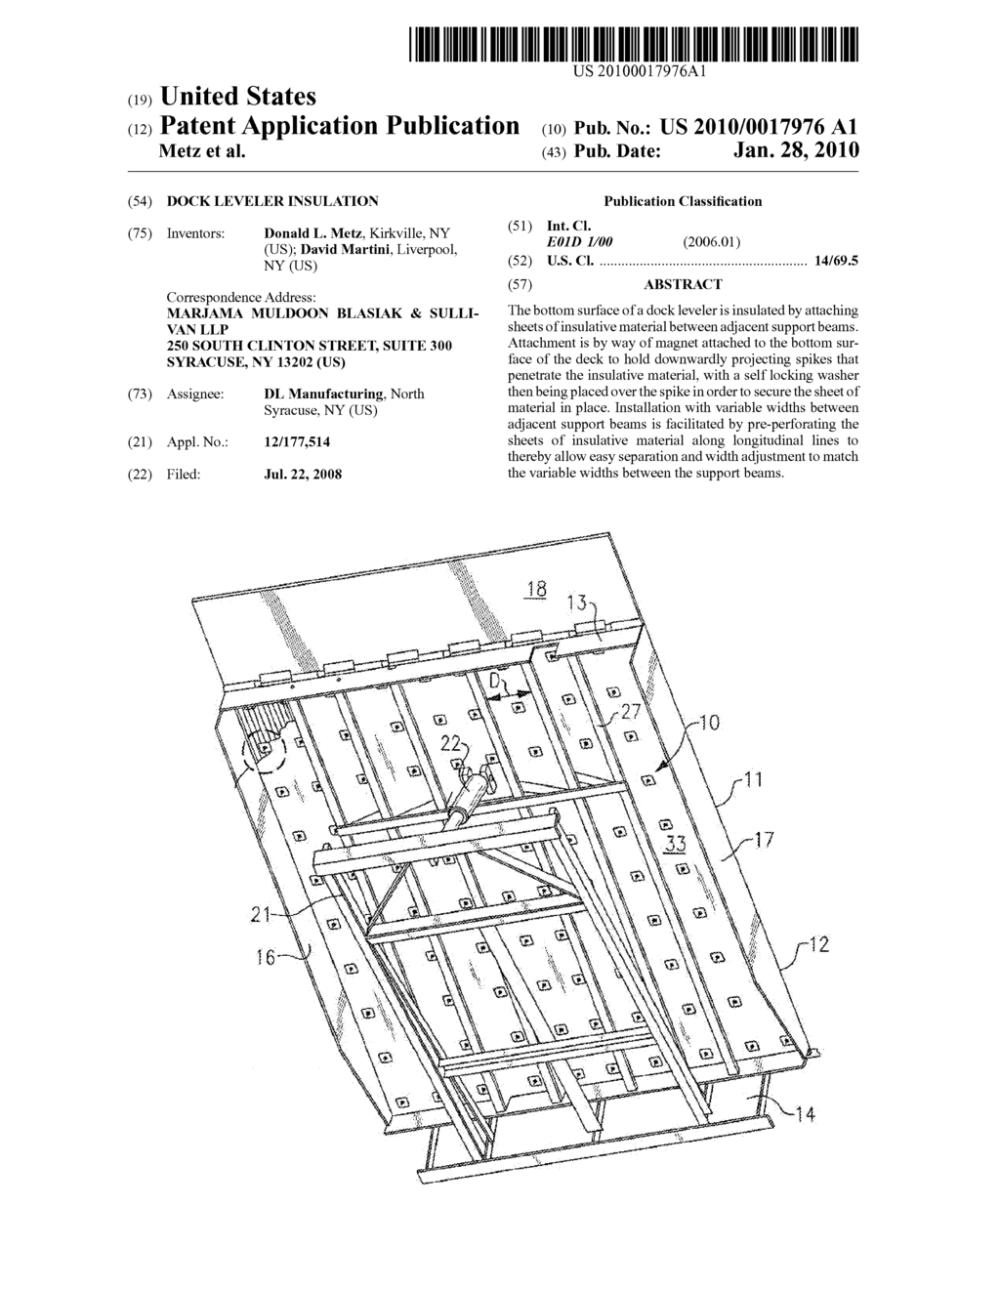 medium resolution of dock leveler insulation diagram schematic and image 01 dock leveler brush seals dock leveler schematic